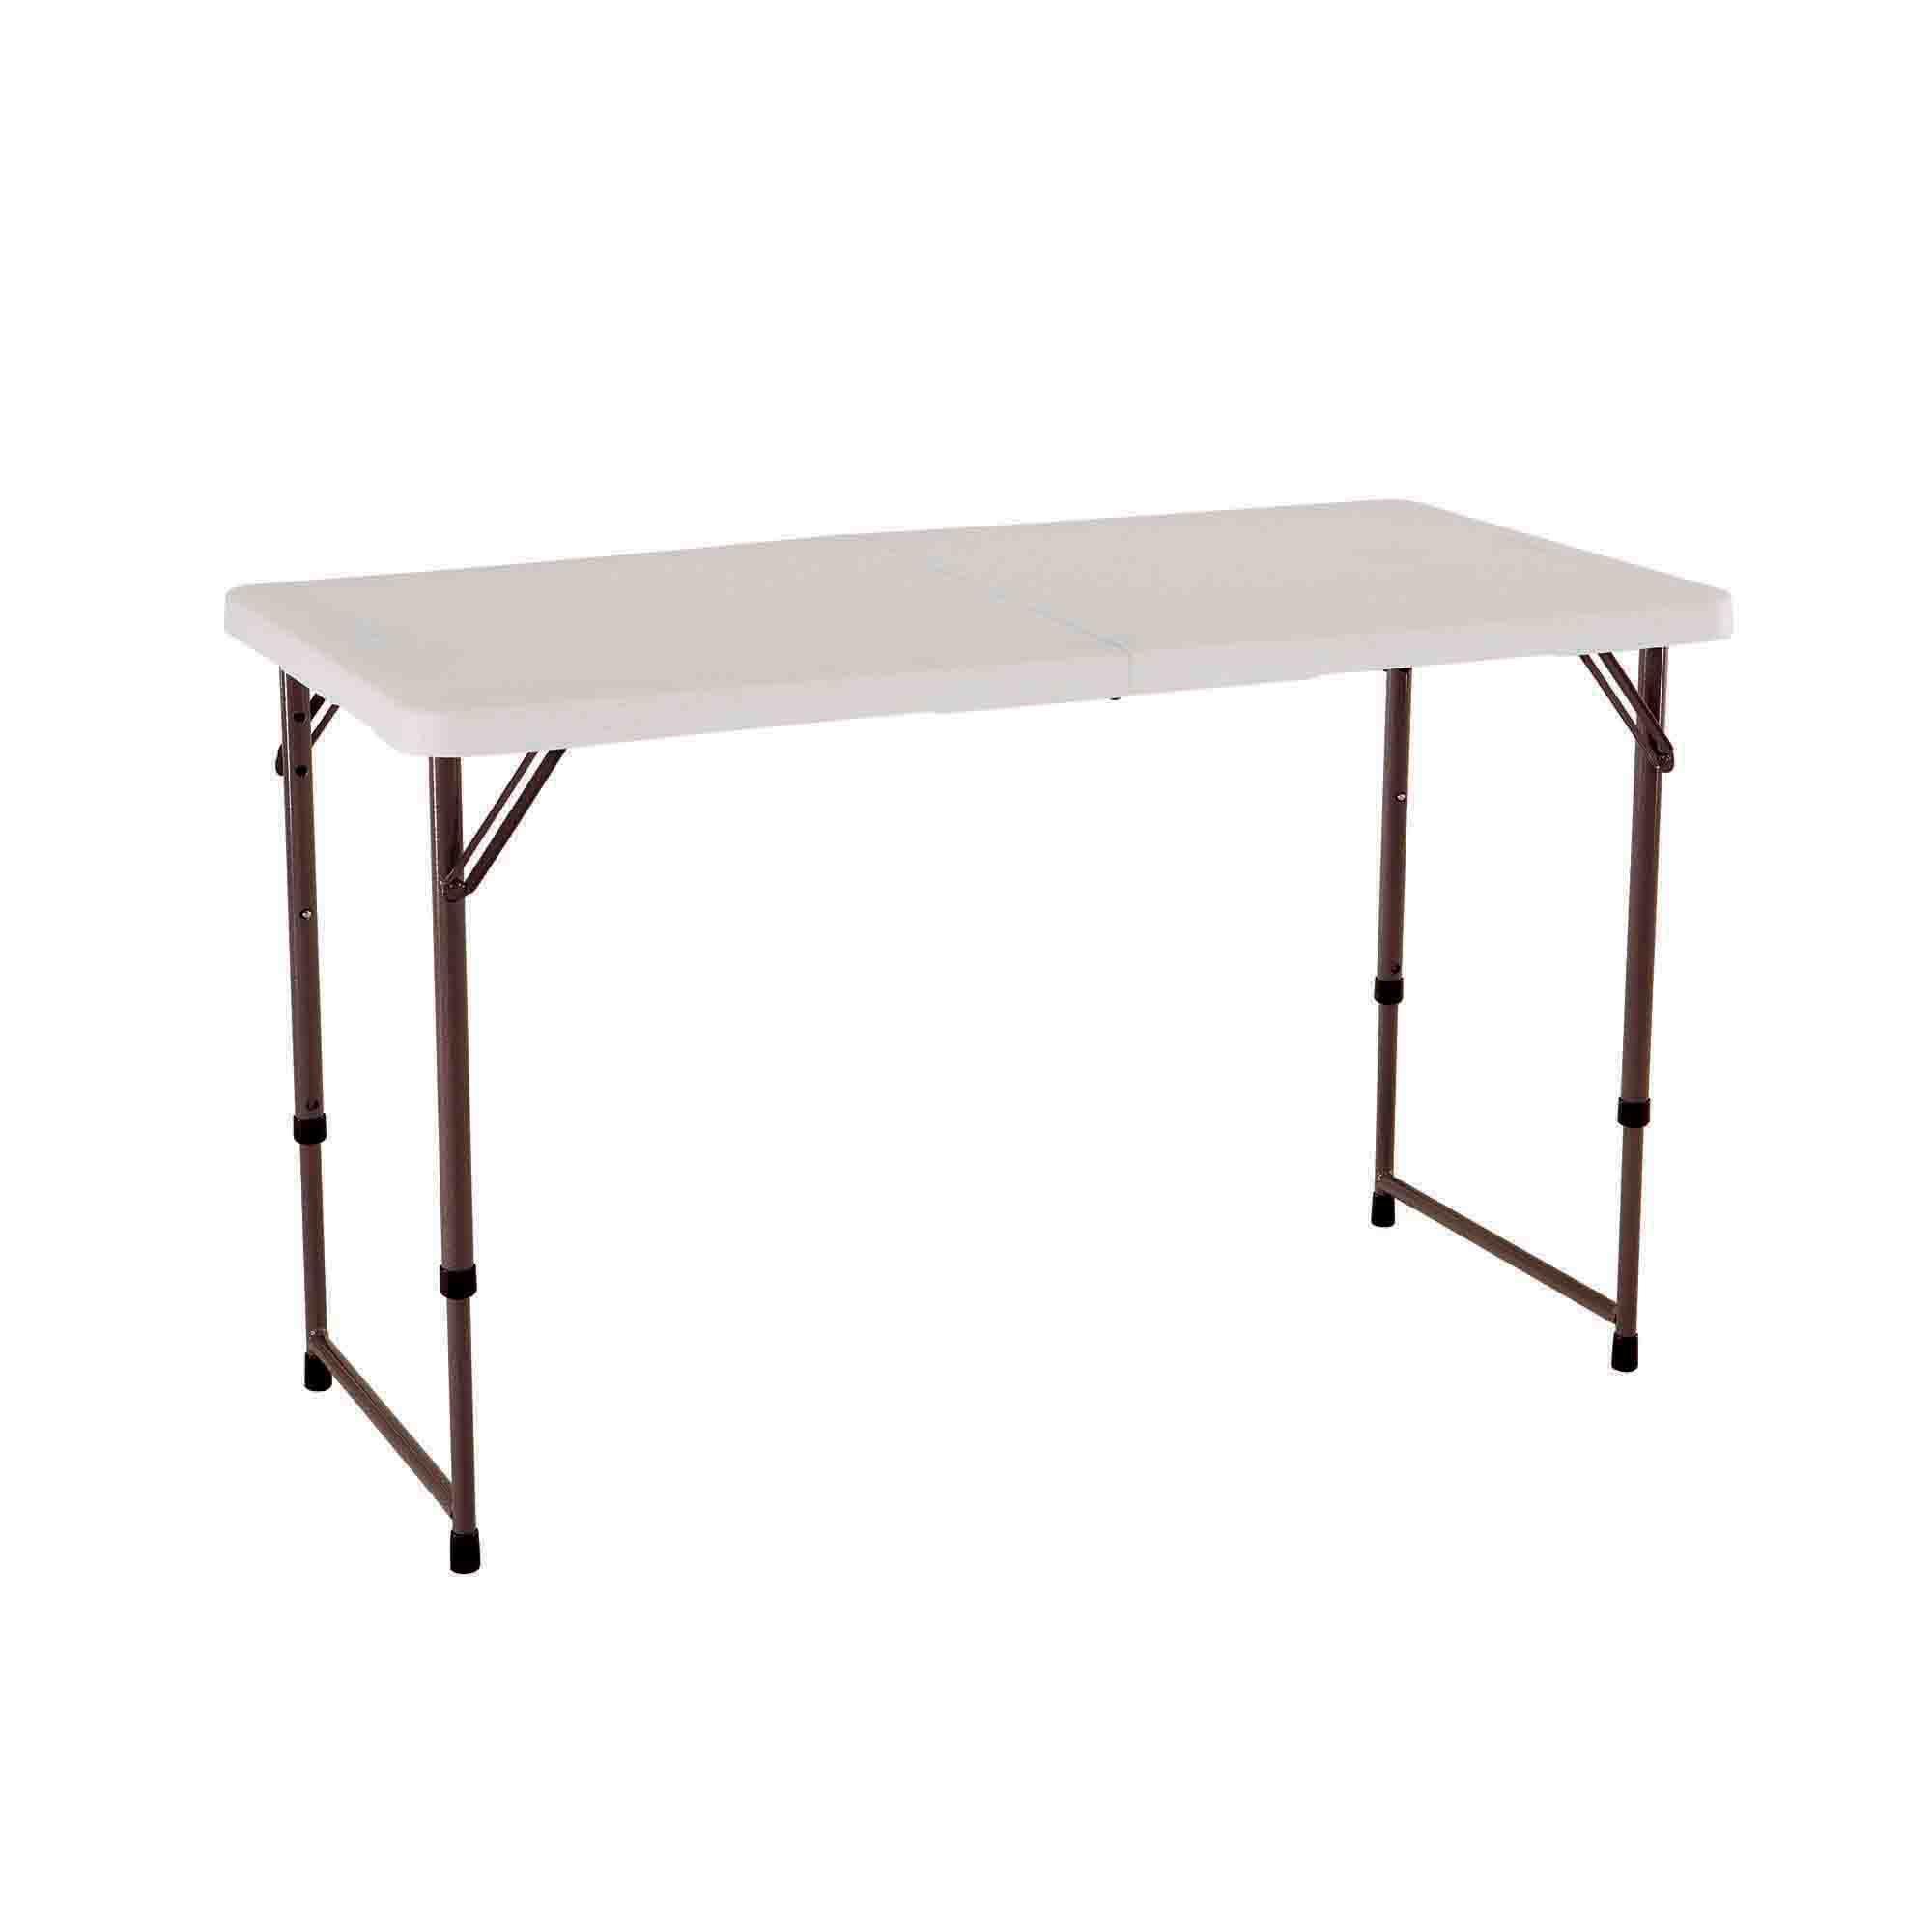 Lifetime 4 Light Commercial Fold In Half Adjustable Table Bjs Wholesale Club